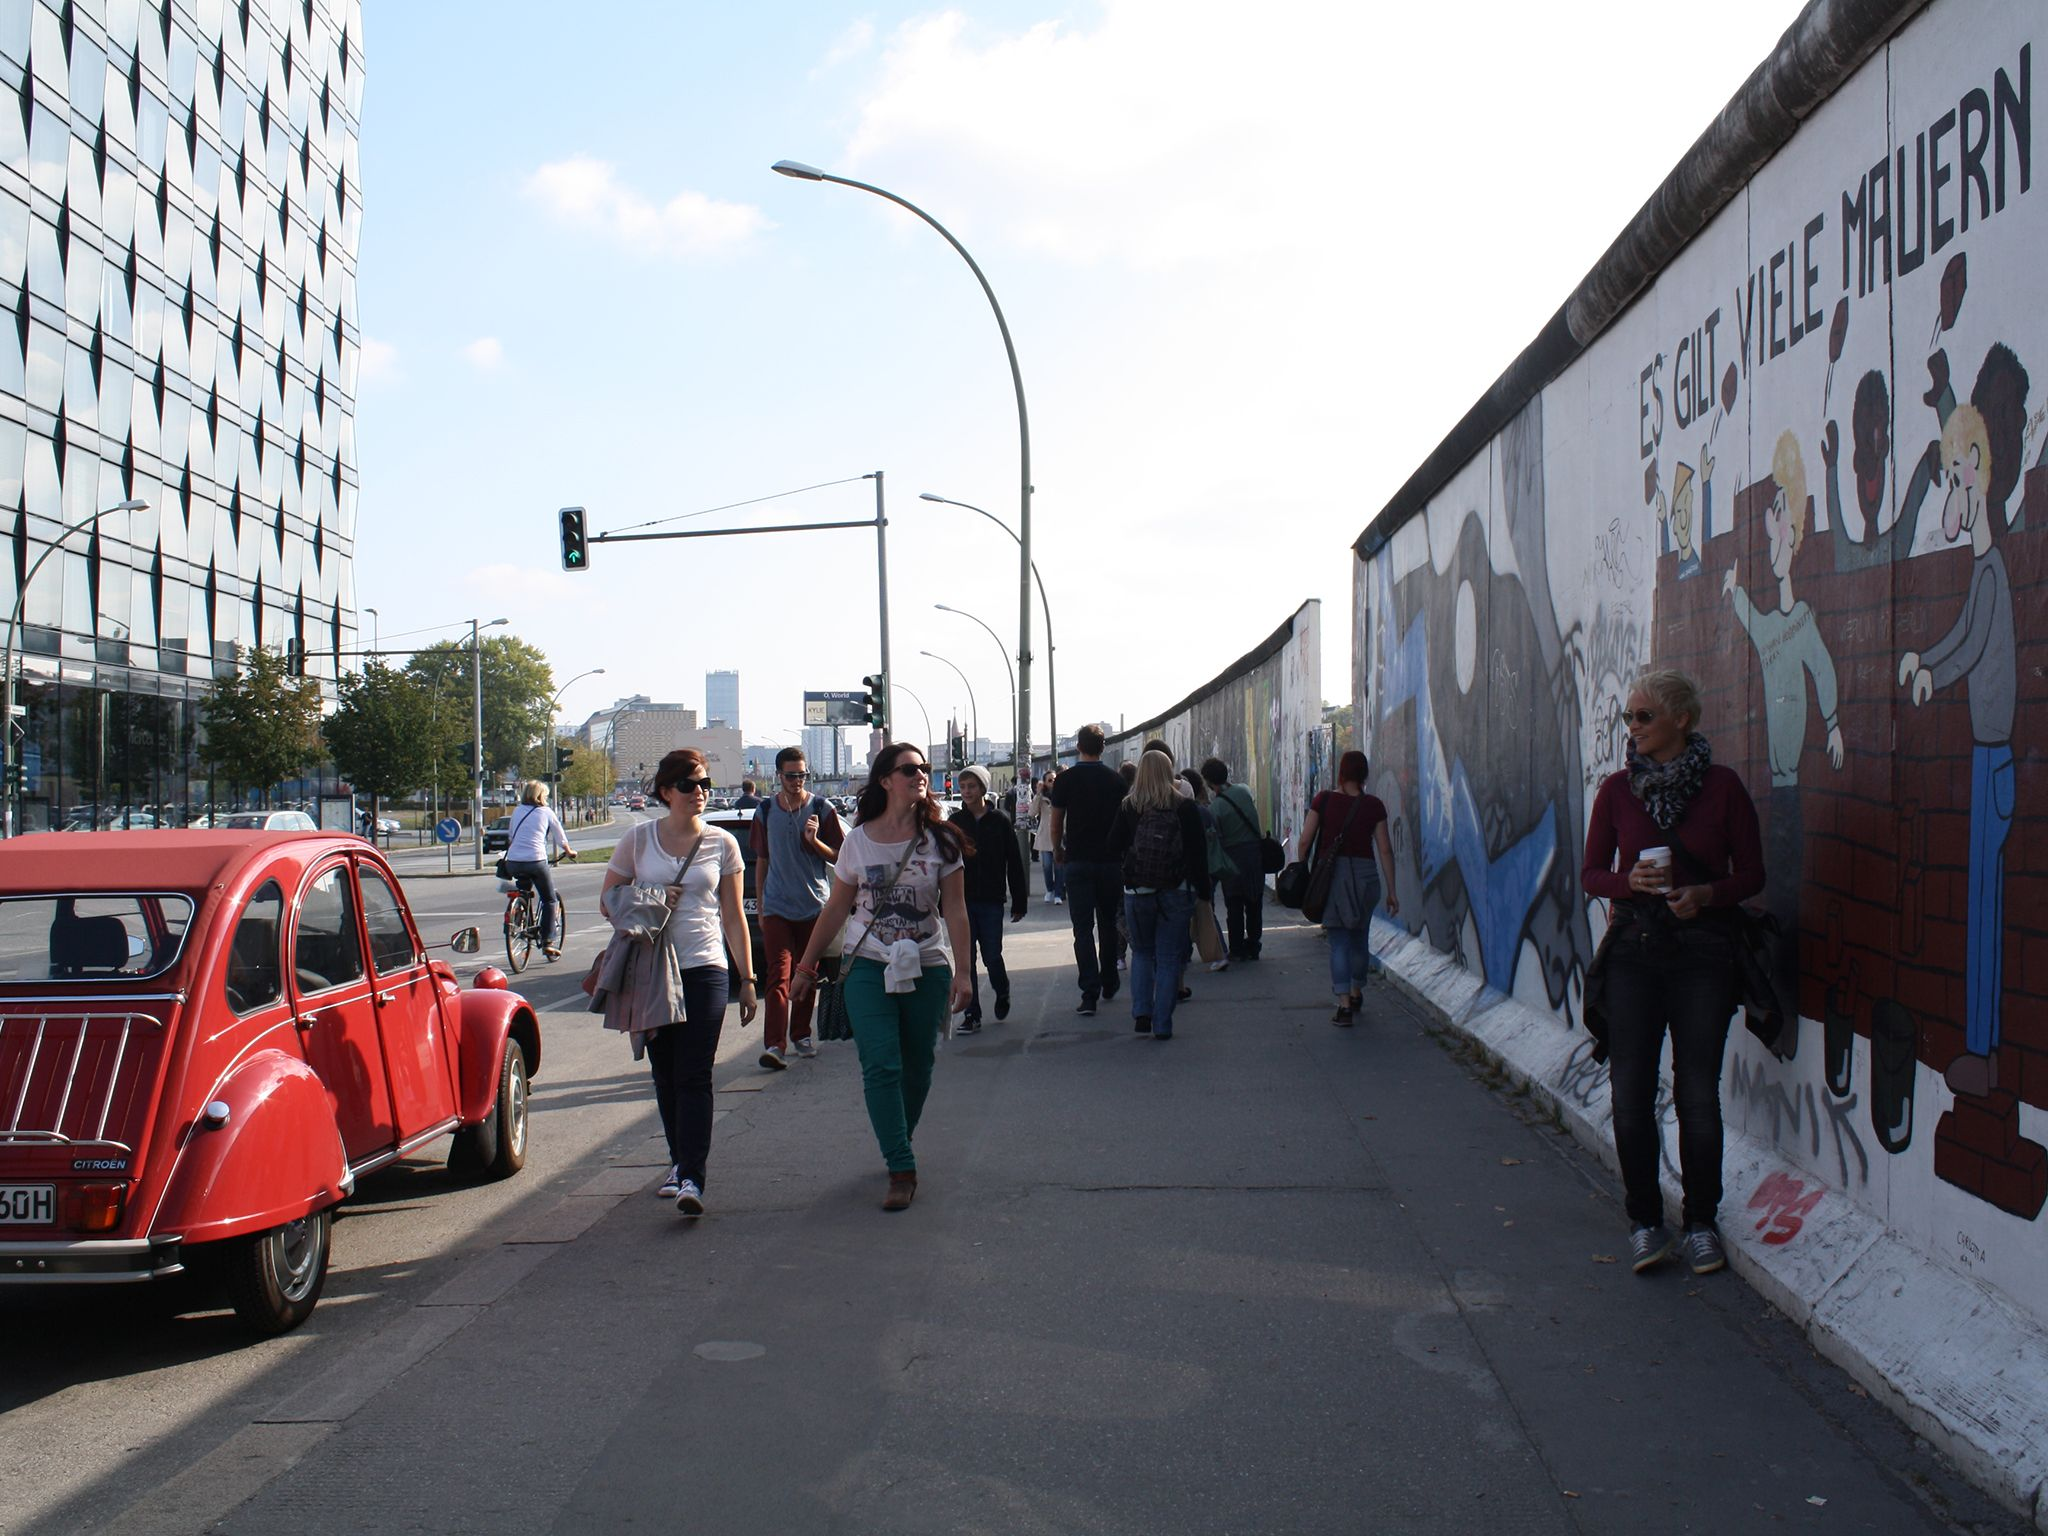 The Art Of The Berlin Wall A Tale Of Two Cities Berlin Wall East Side Gallery Berlin